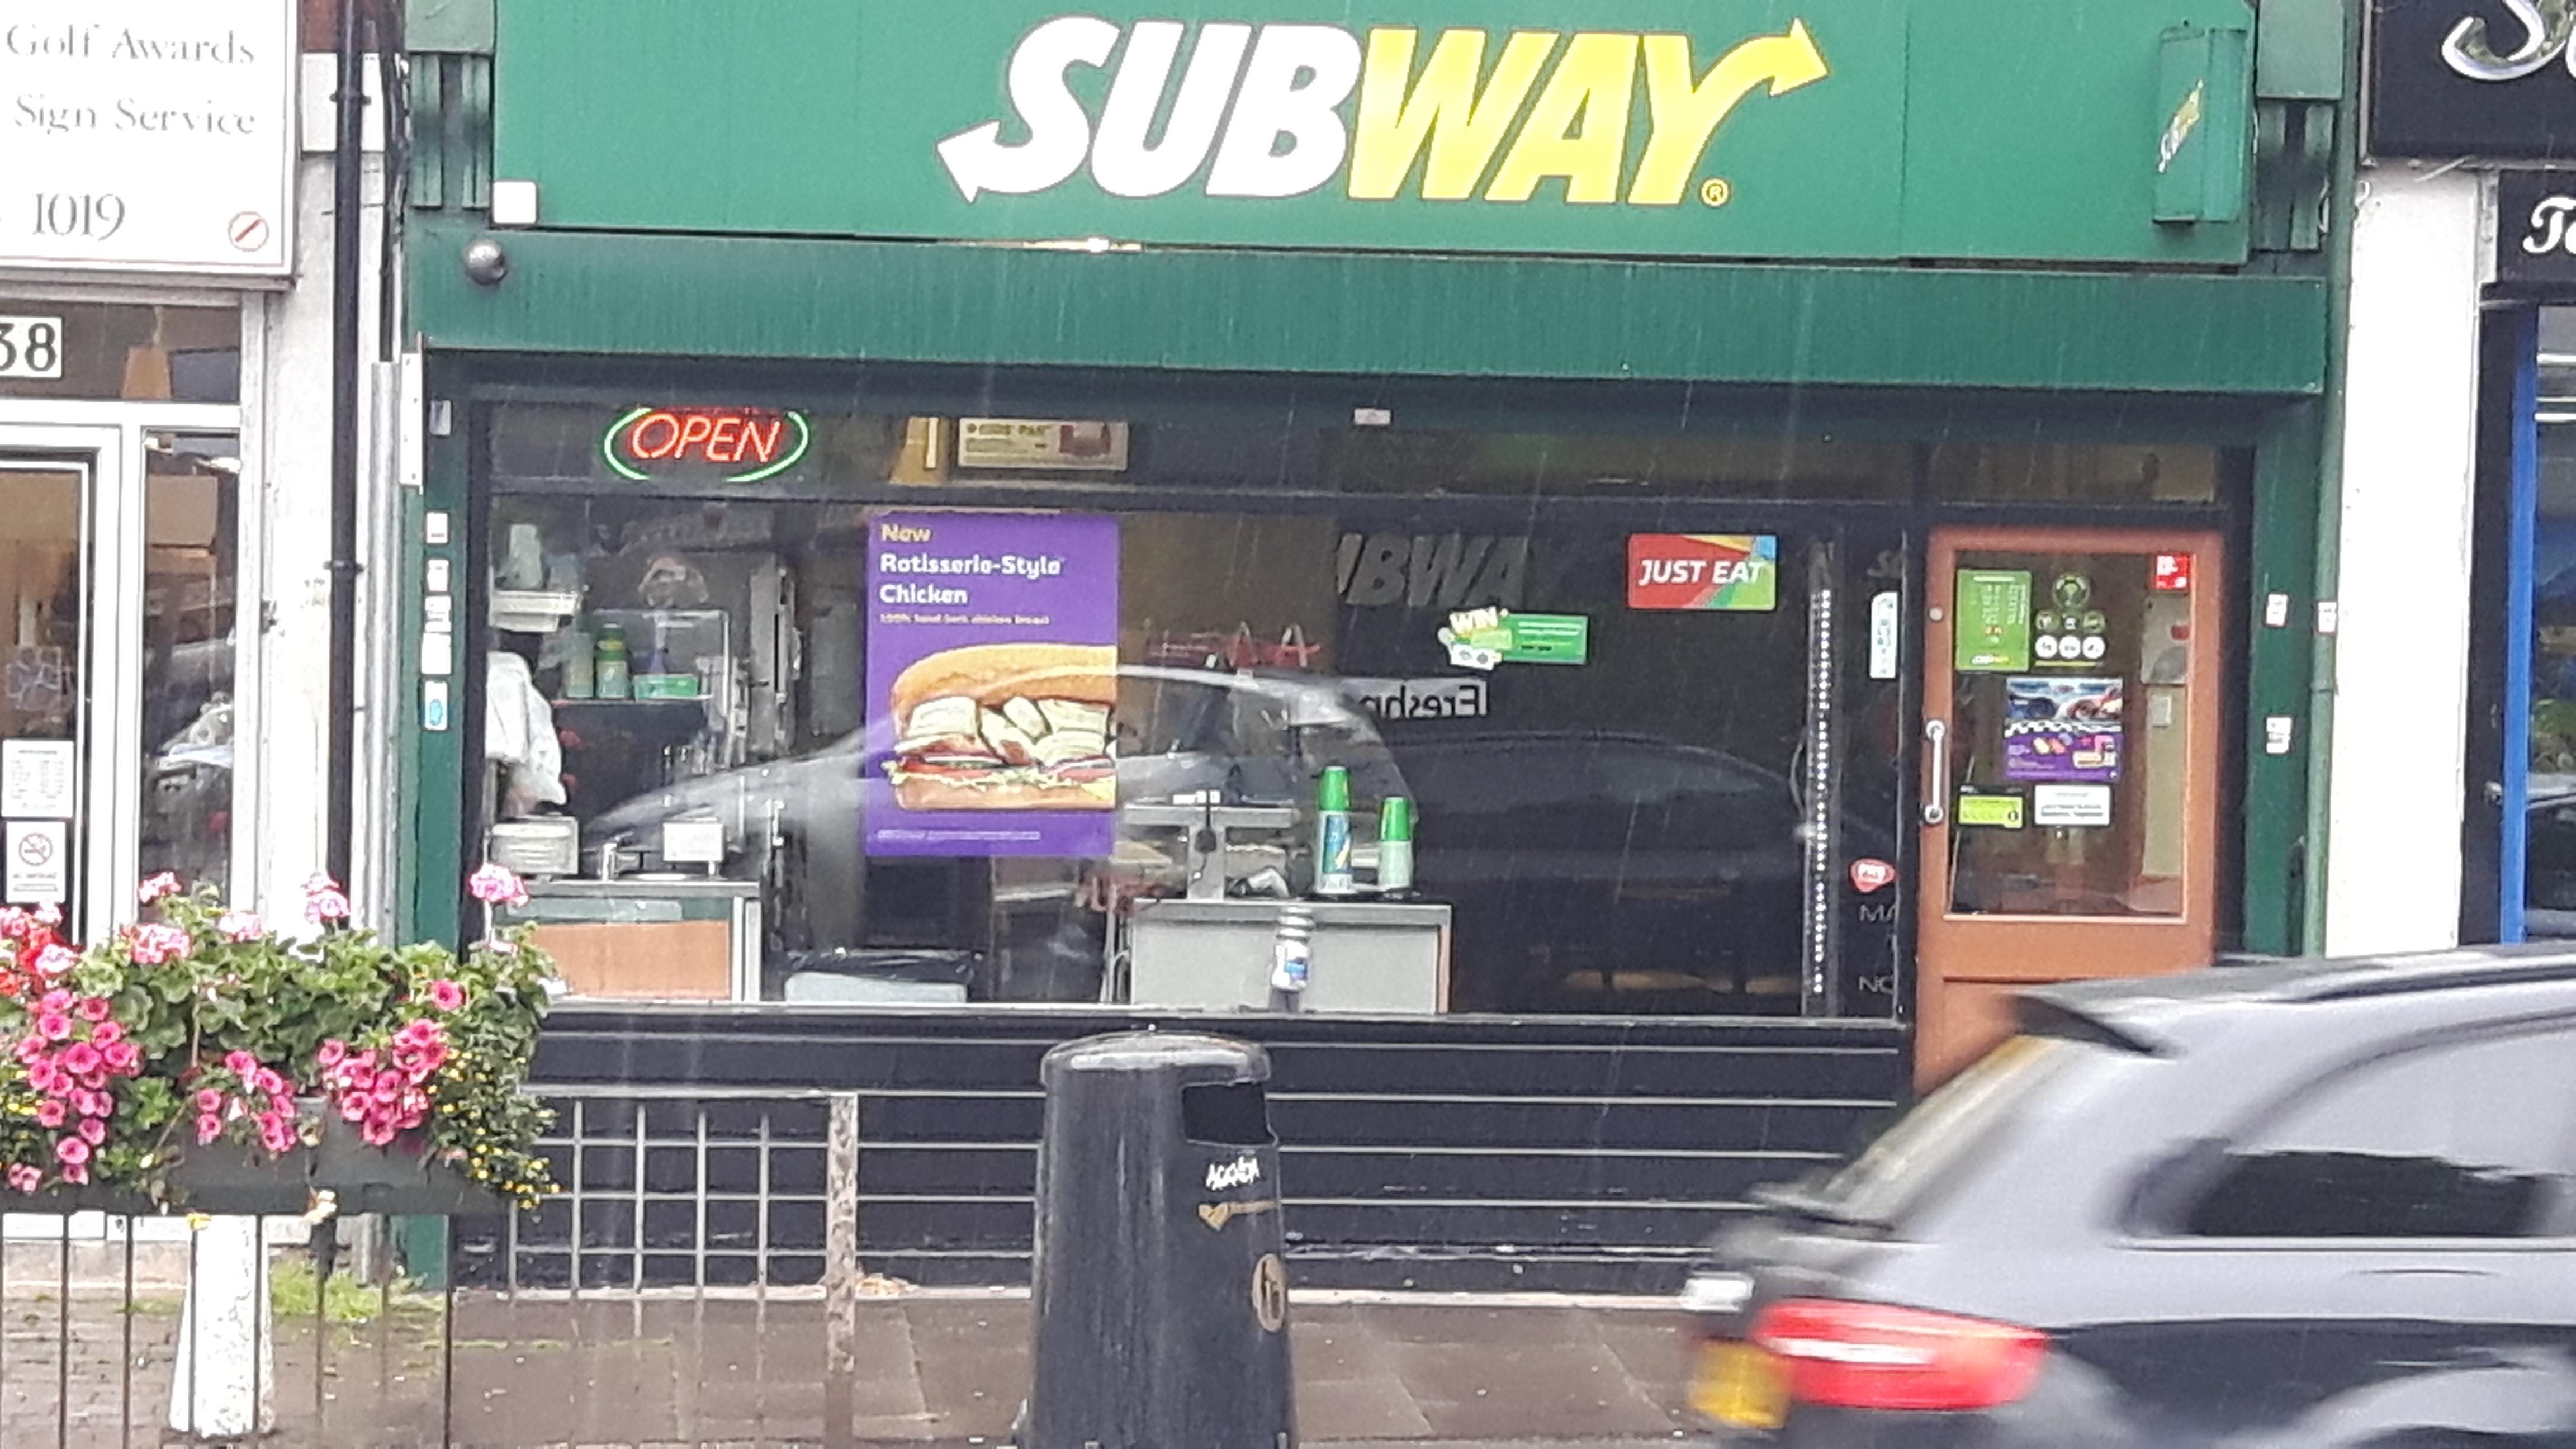 Premier Halal Subway Store In Prime, Vibrant, Birmingham Location